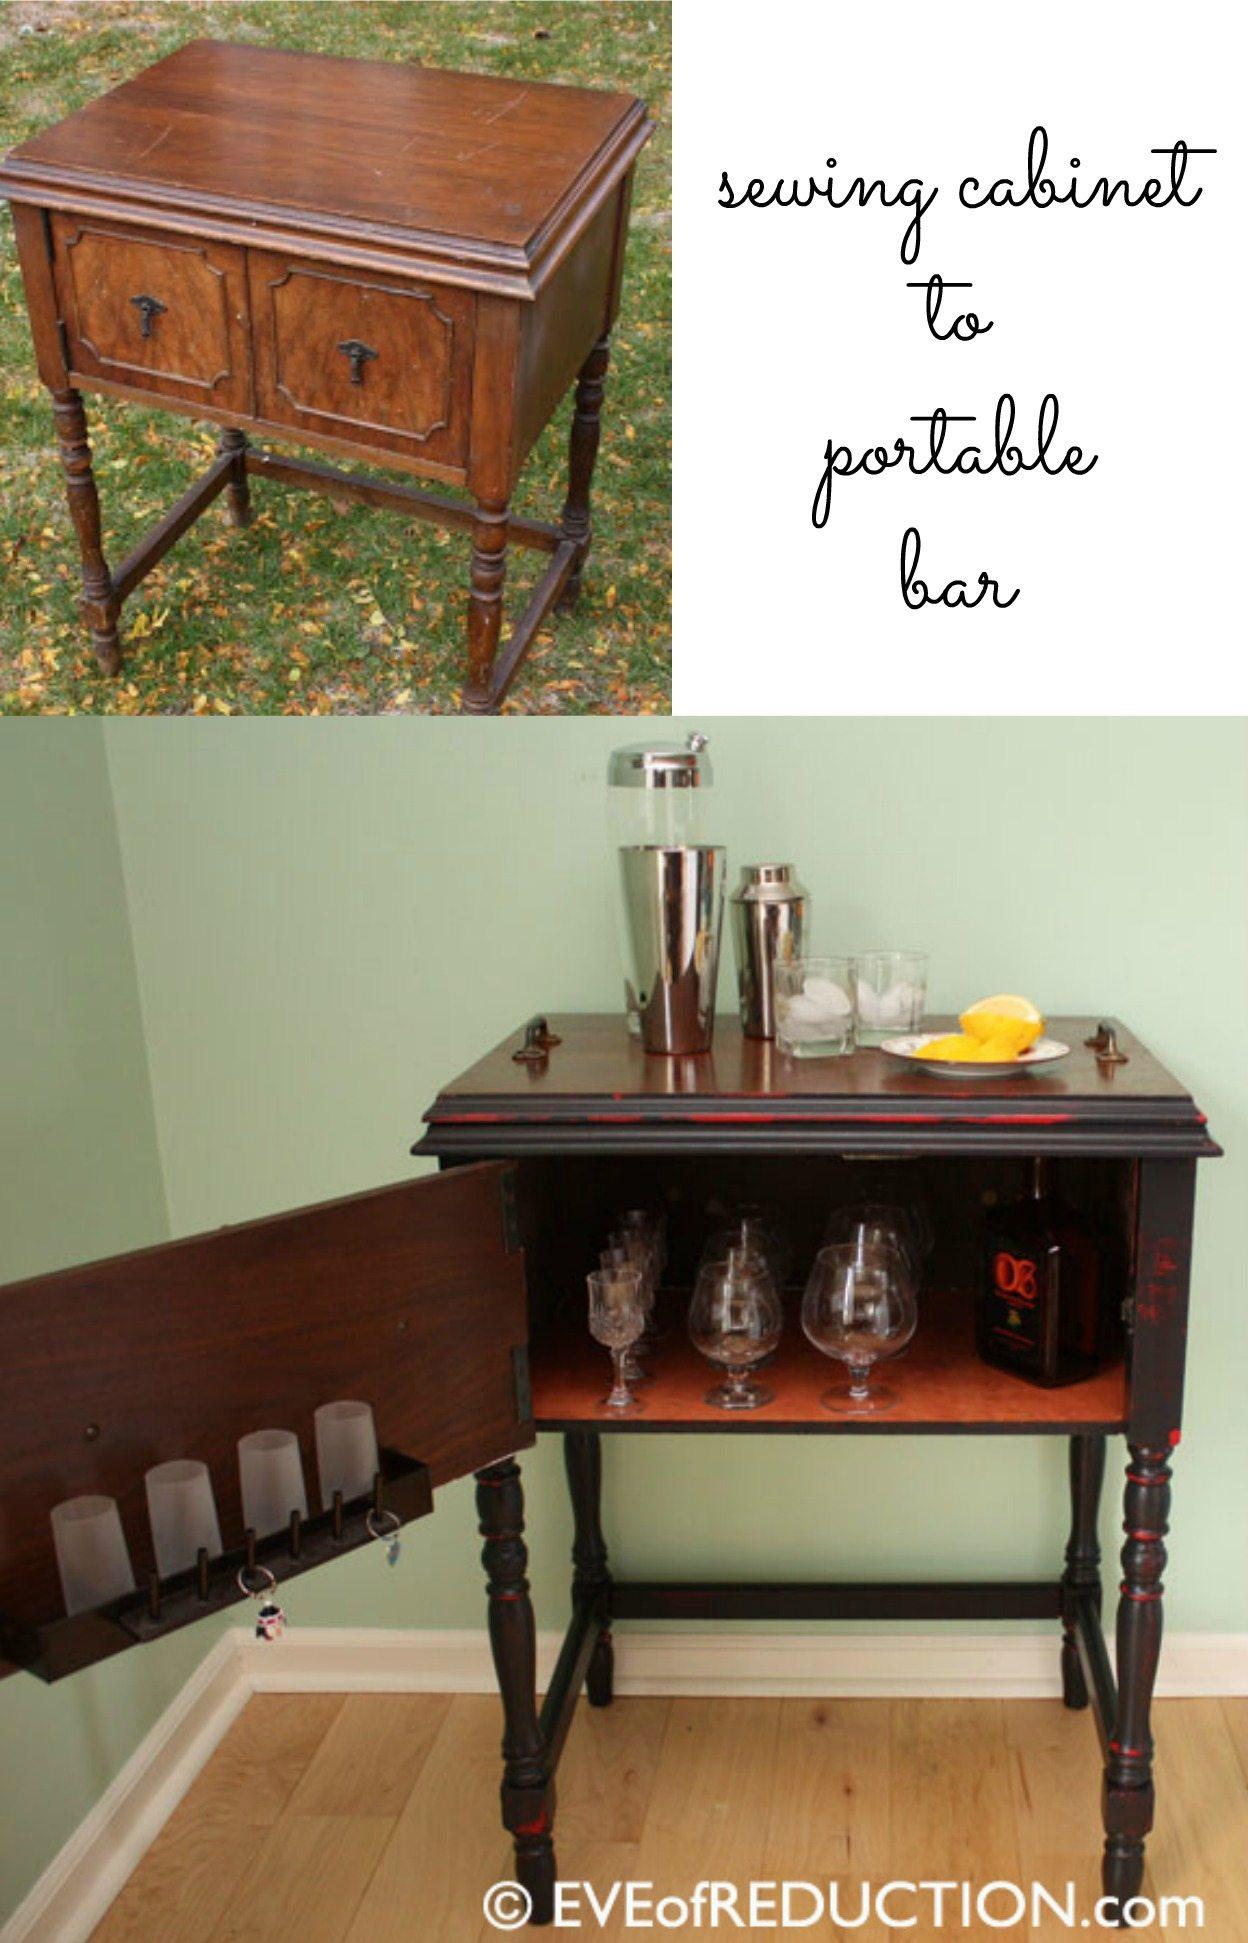 Sewing Cabinet Bar My Repurposed Life